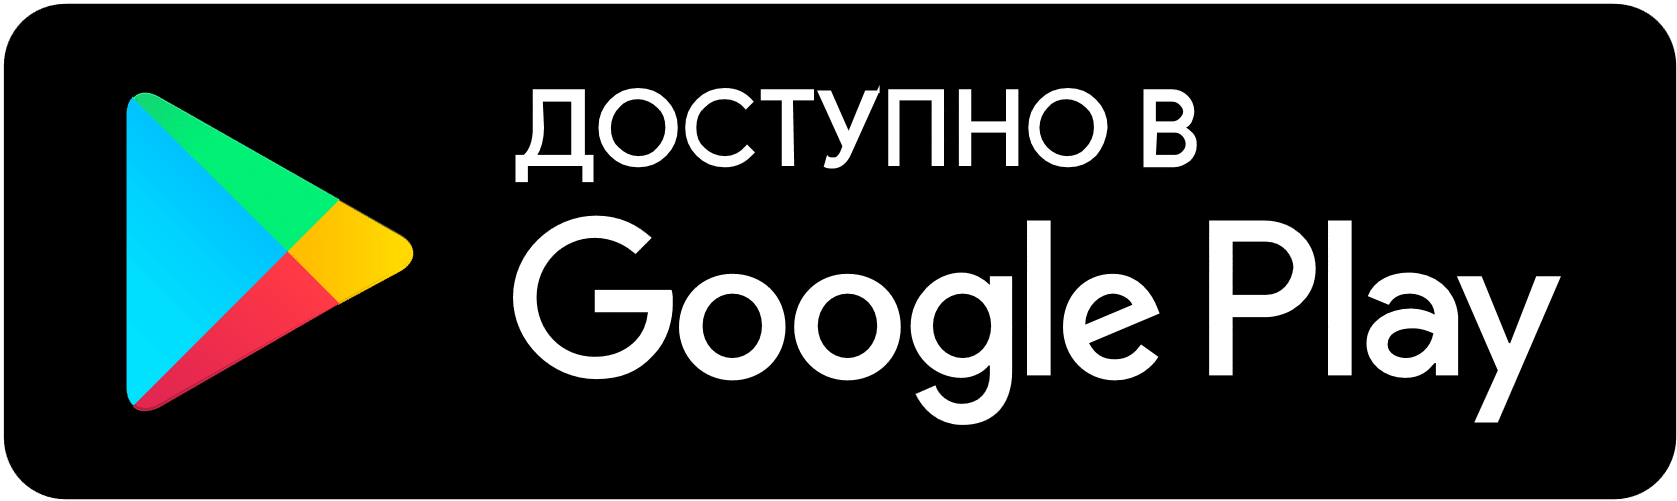 download-googleplay-1